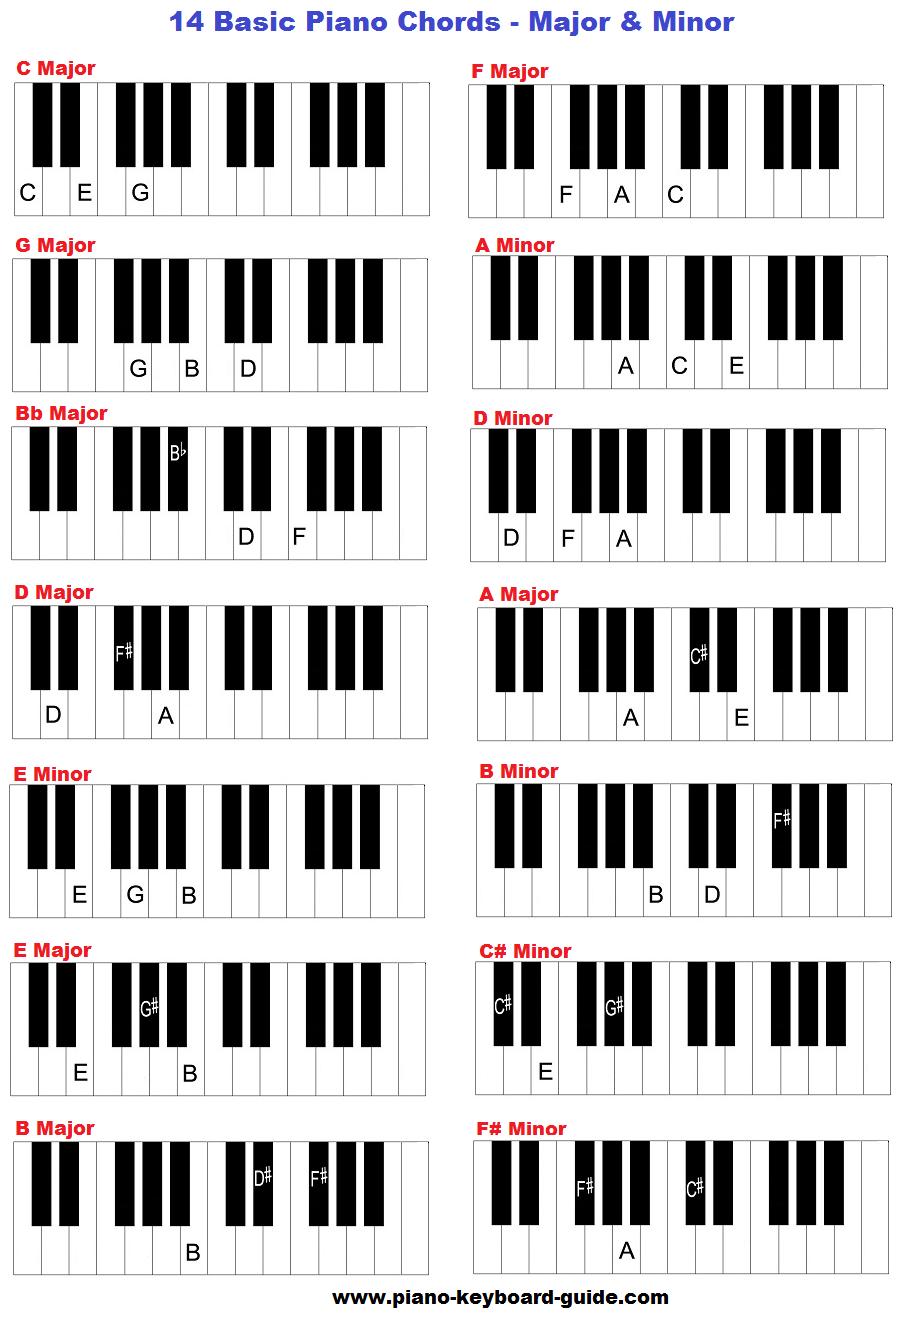 36 Key Keyboard : keyboard, Learn, Basic, Piano, Chords